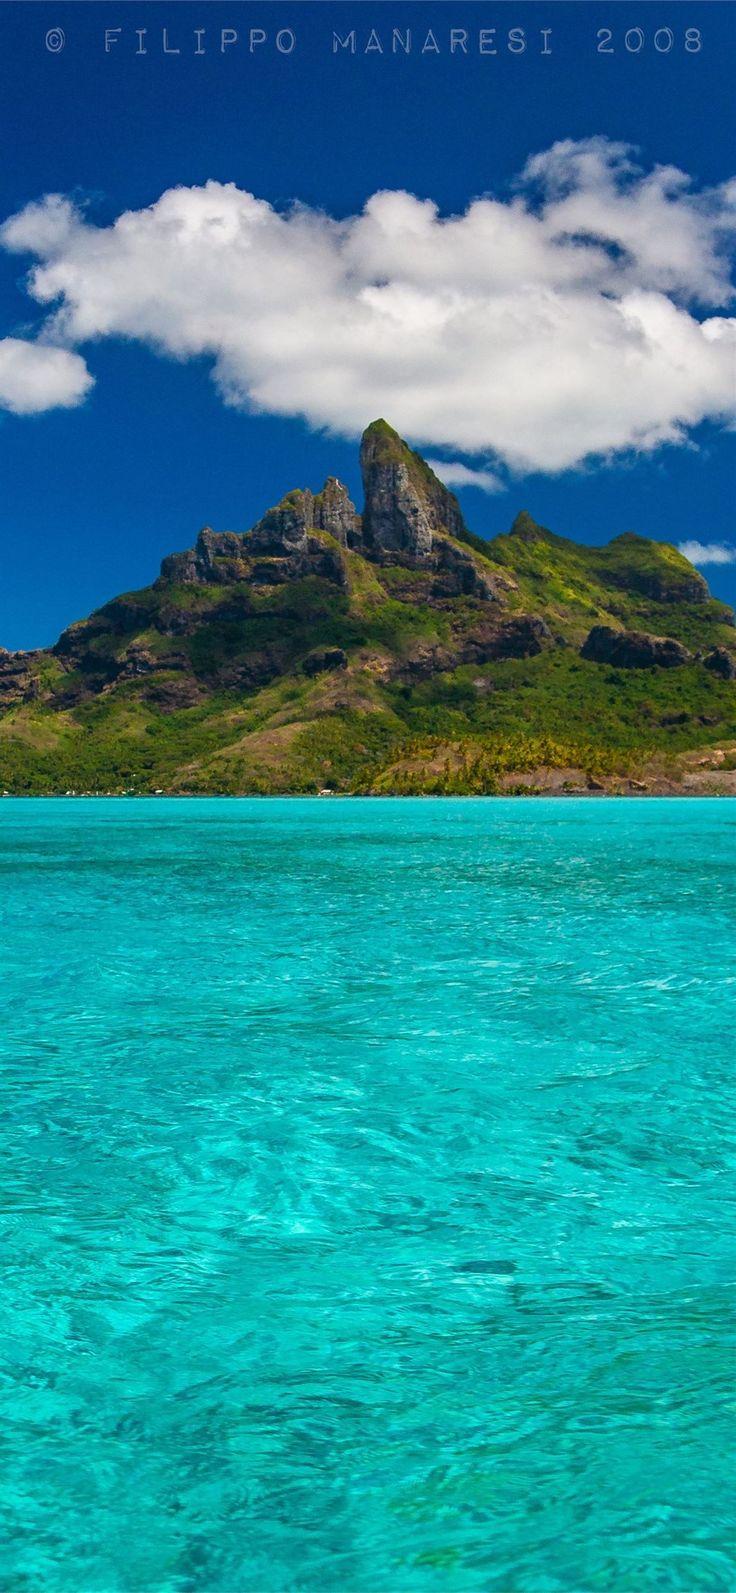 Bora Bora Backgrounds And More Borabora 100mostbeautifulplacestovisit Frenchpolynesia Iphone11wallpa Bora Bora Best Iphone Wallpapers Hd Iphone Backgrounds